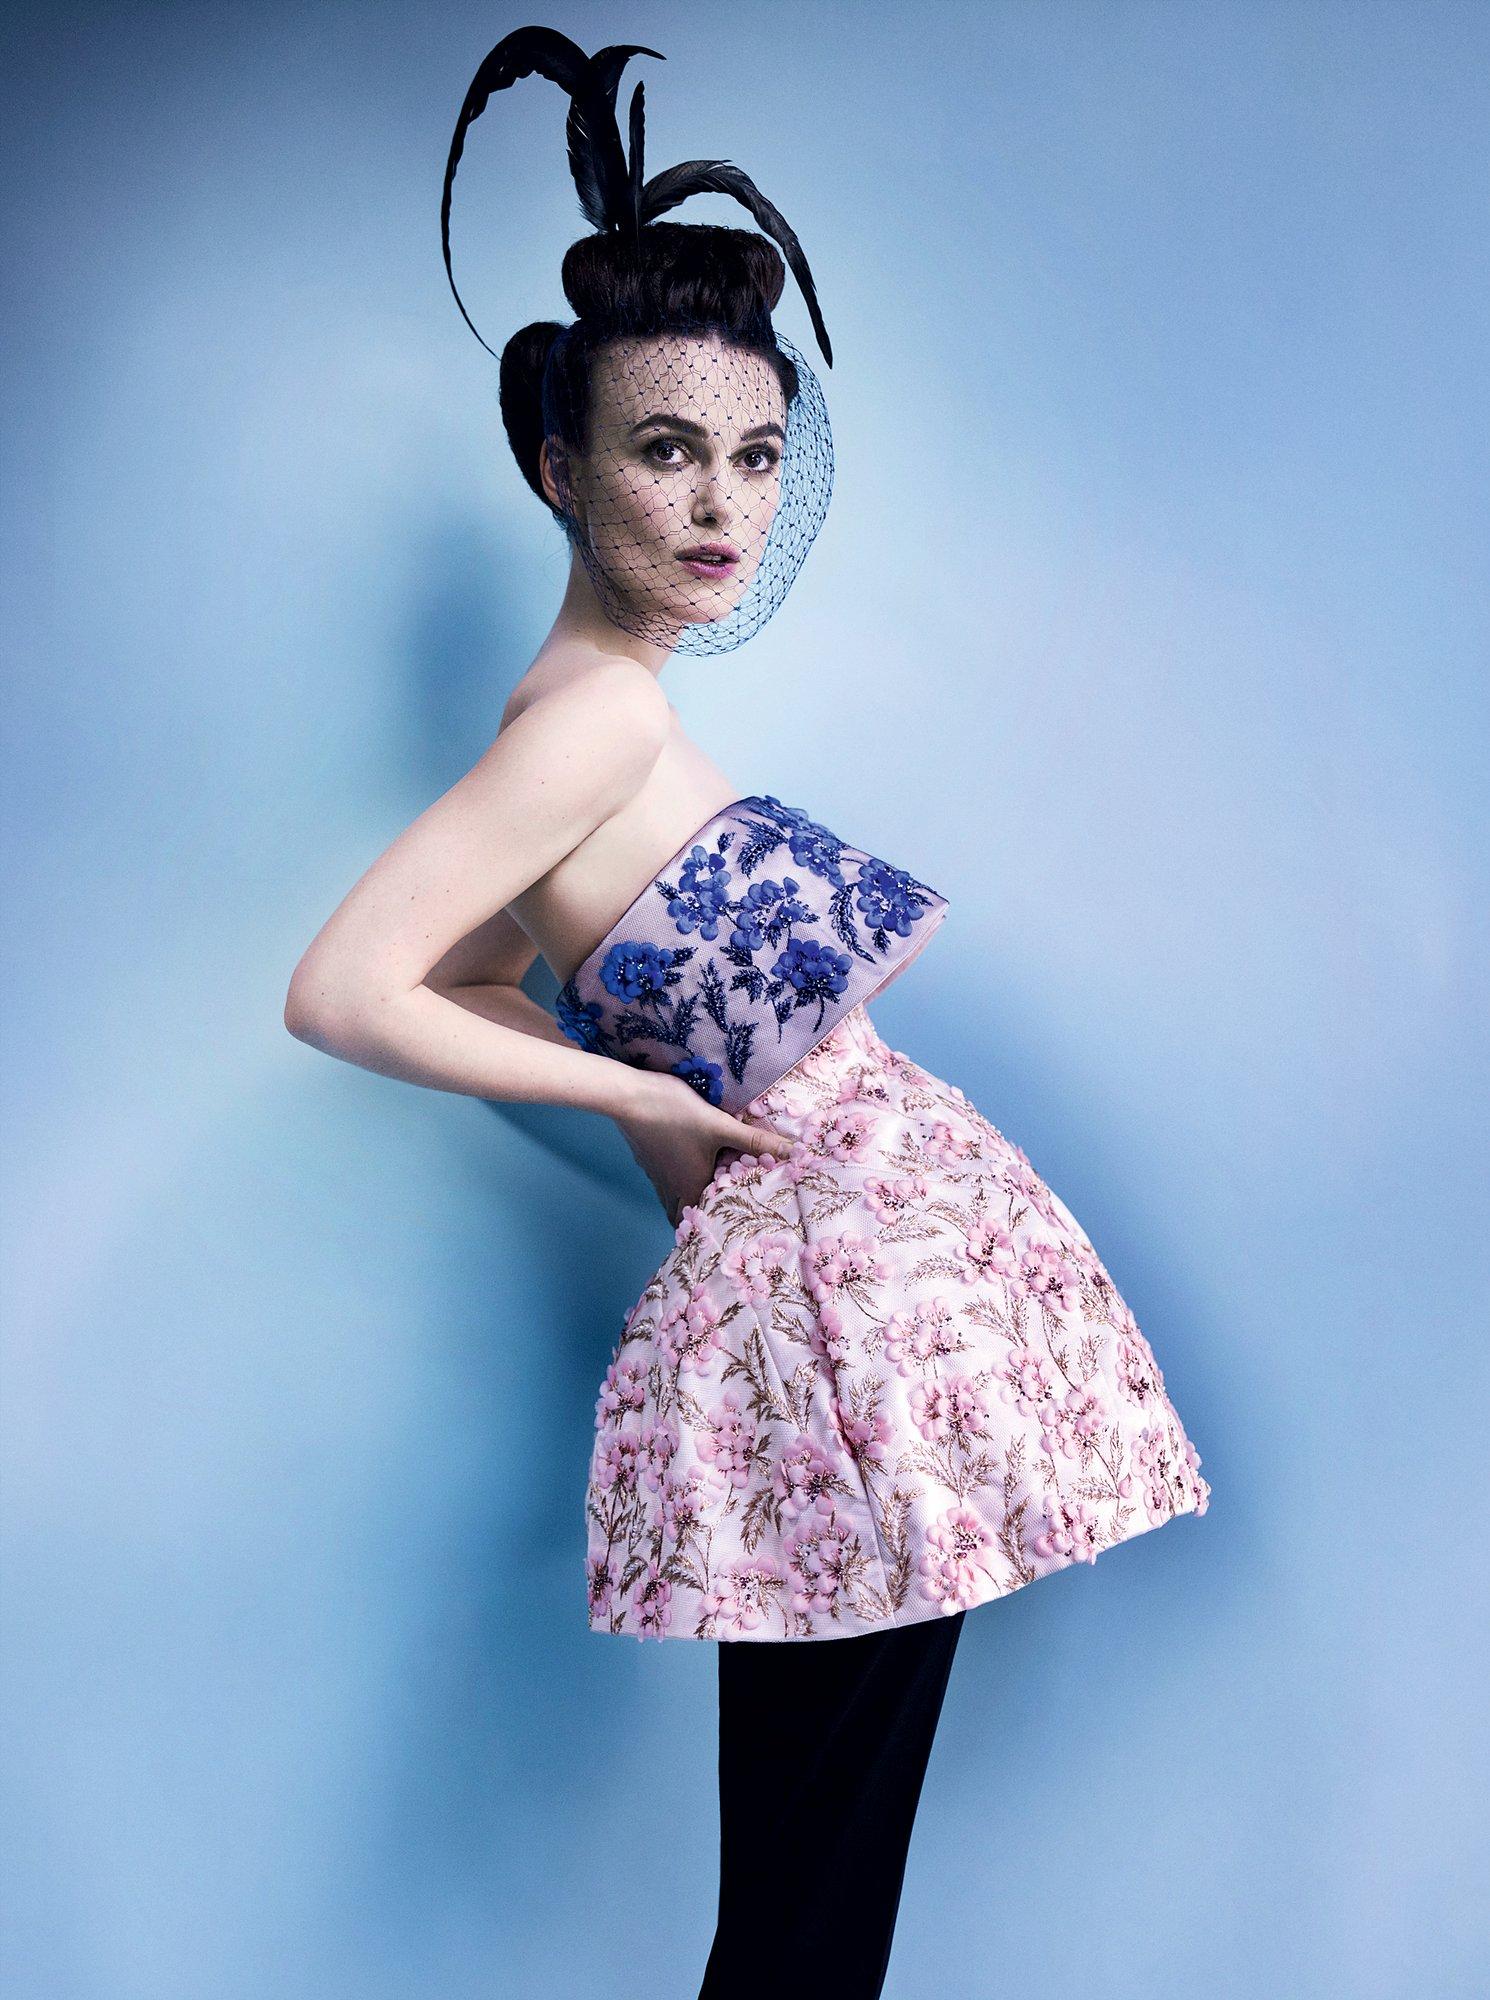 Keira Nightley in Christian Dior Haute Couture